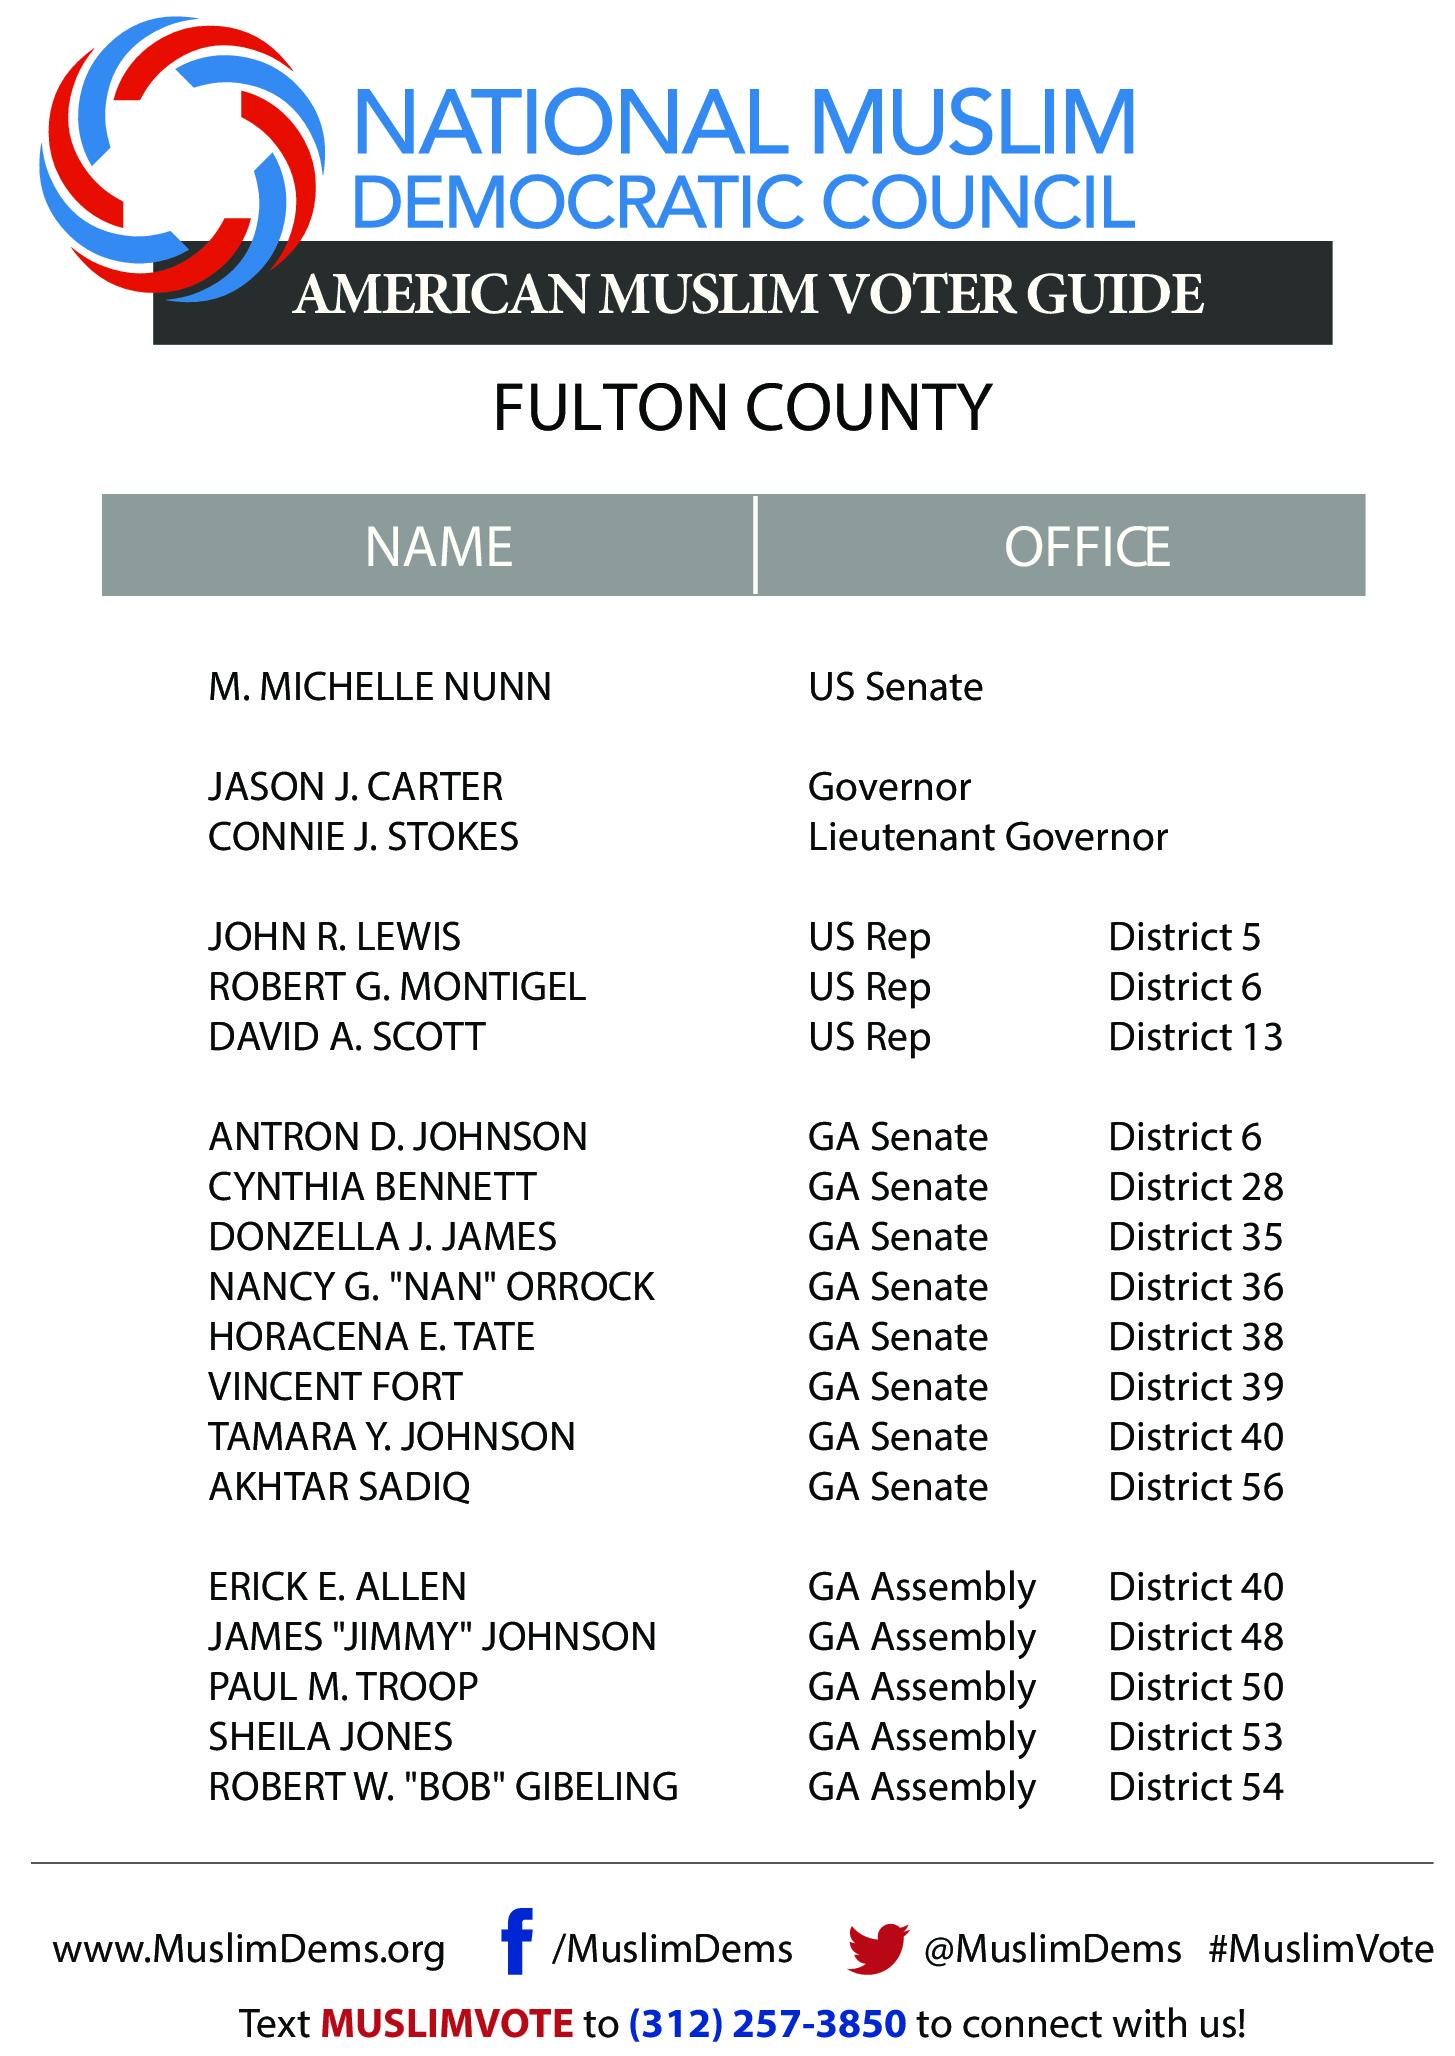 FultonATL_2014-page-0.jpg